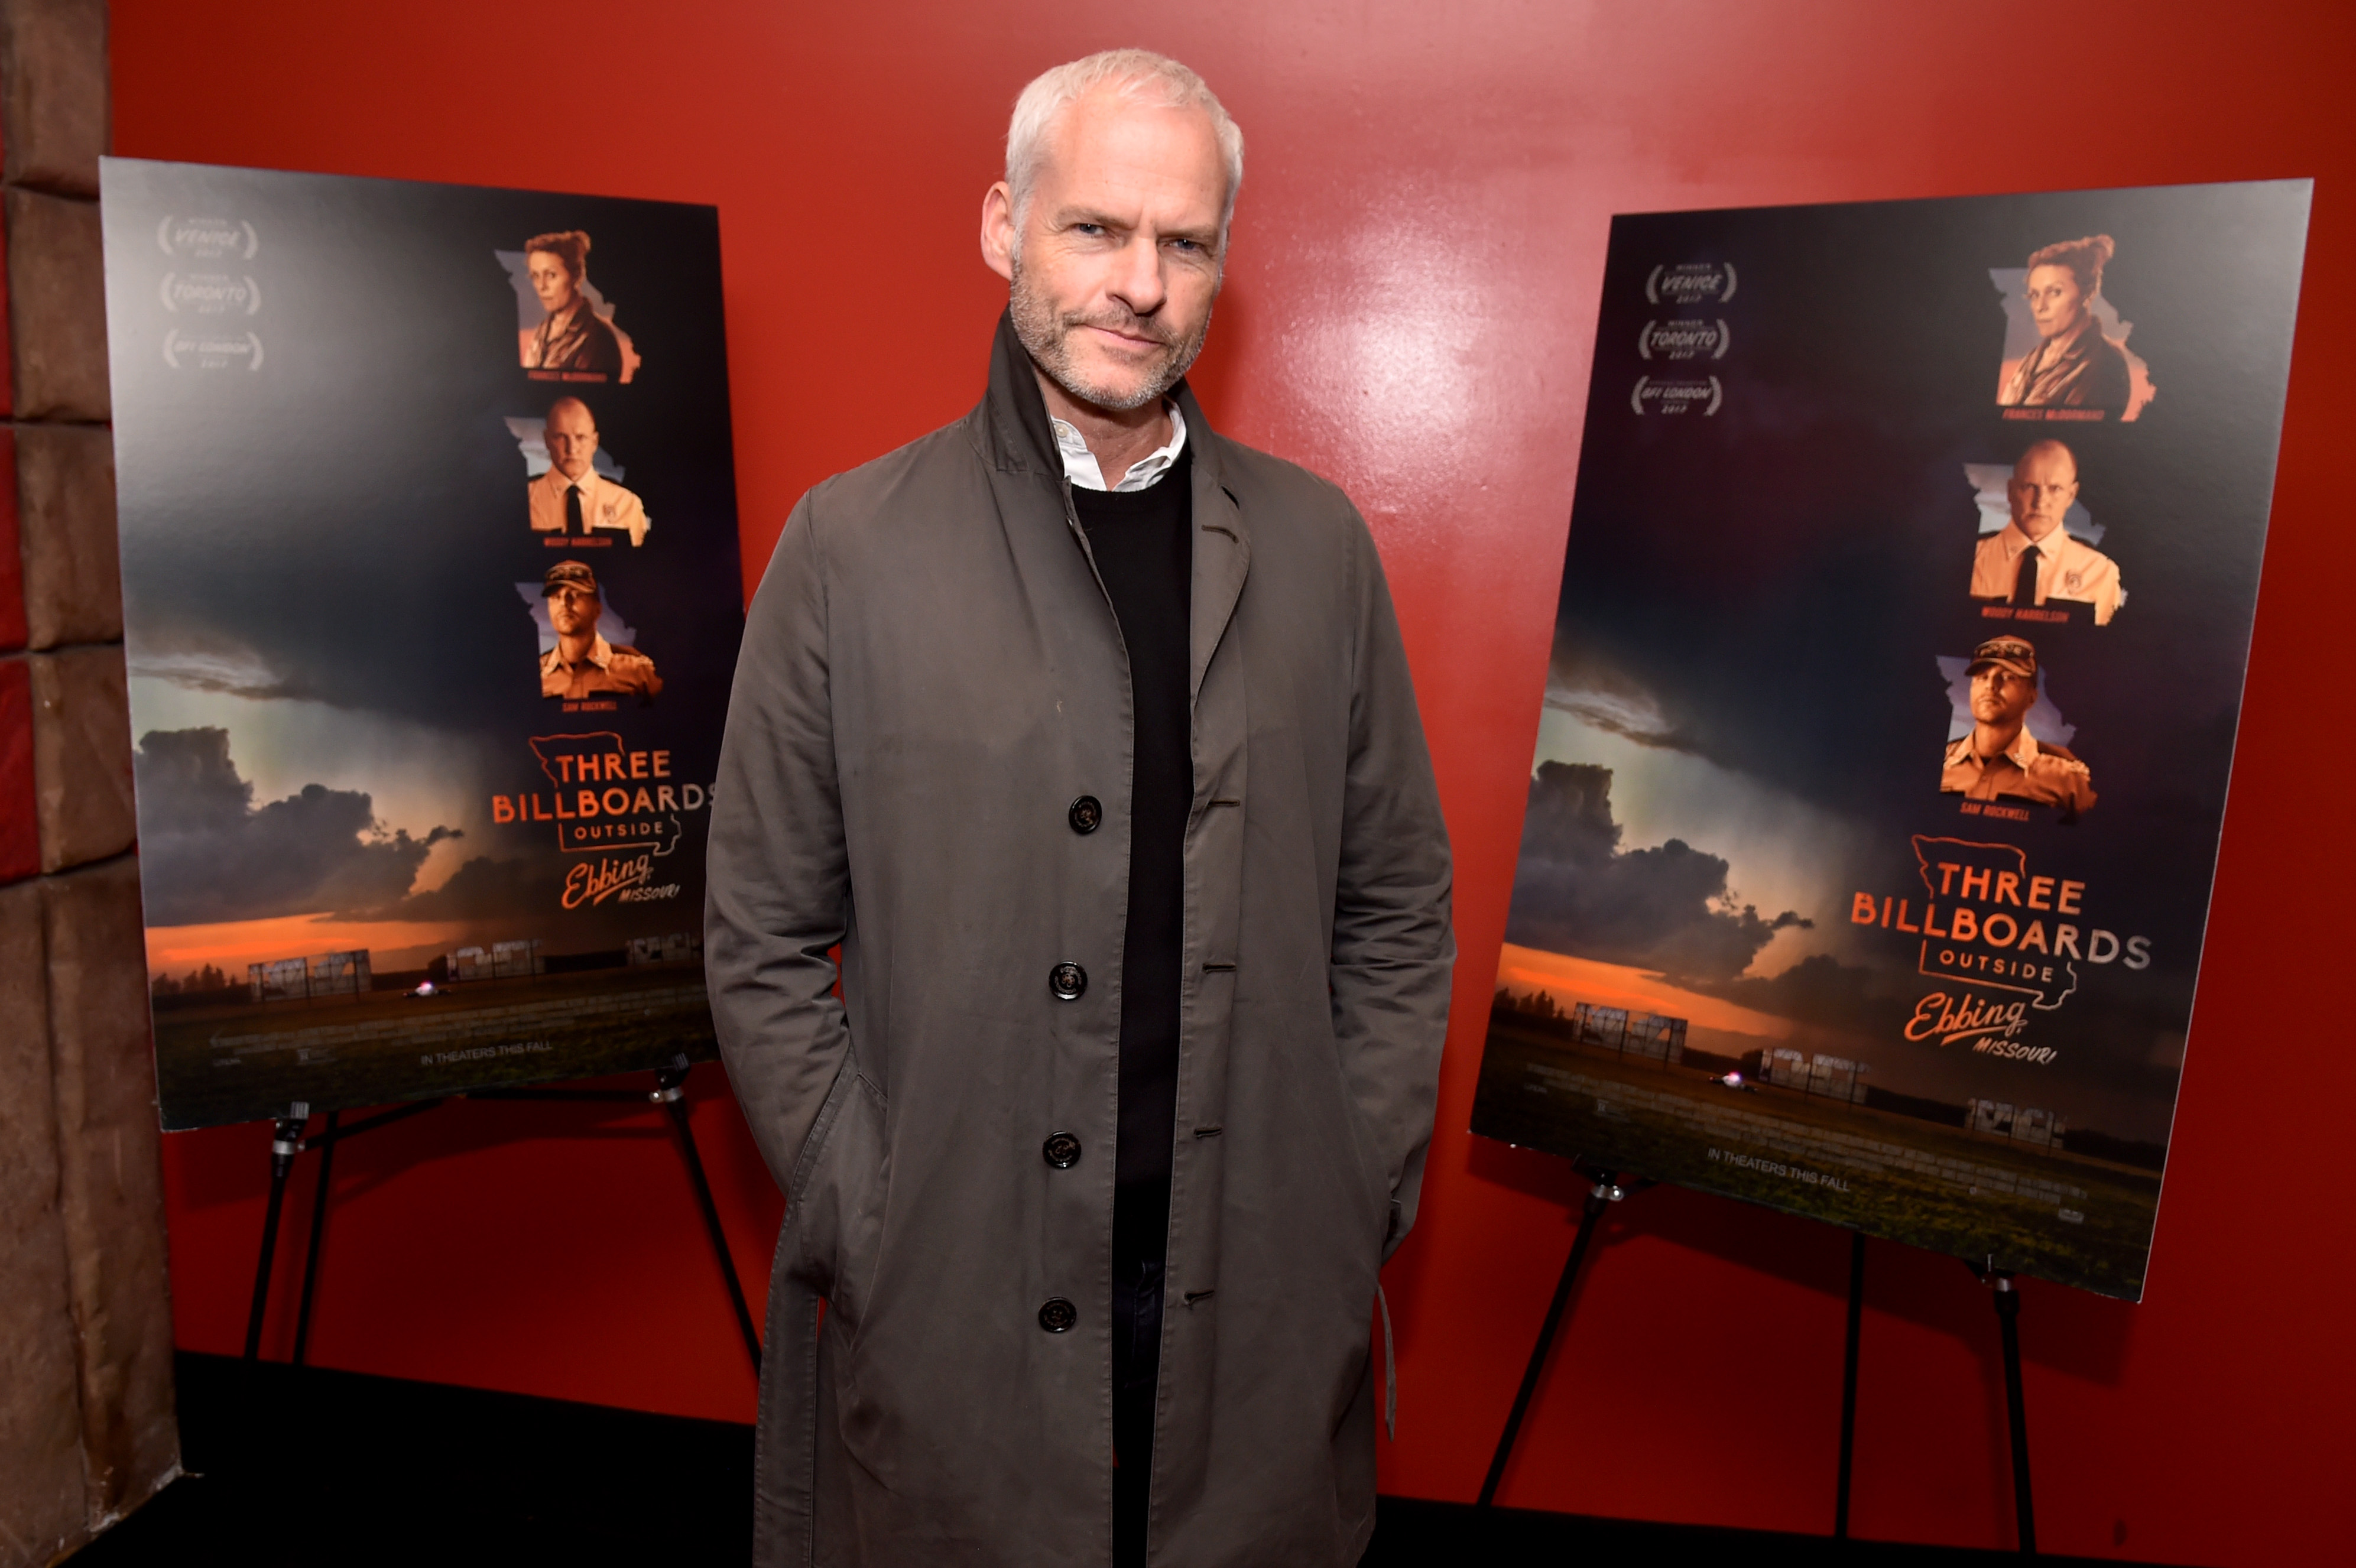 Martin McDonagh'Three Billboards Outside Ebbing, Missouri' BAFTA film screening, New York, USA - 05 Nov 2017